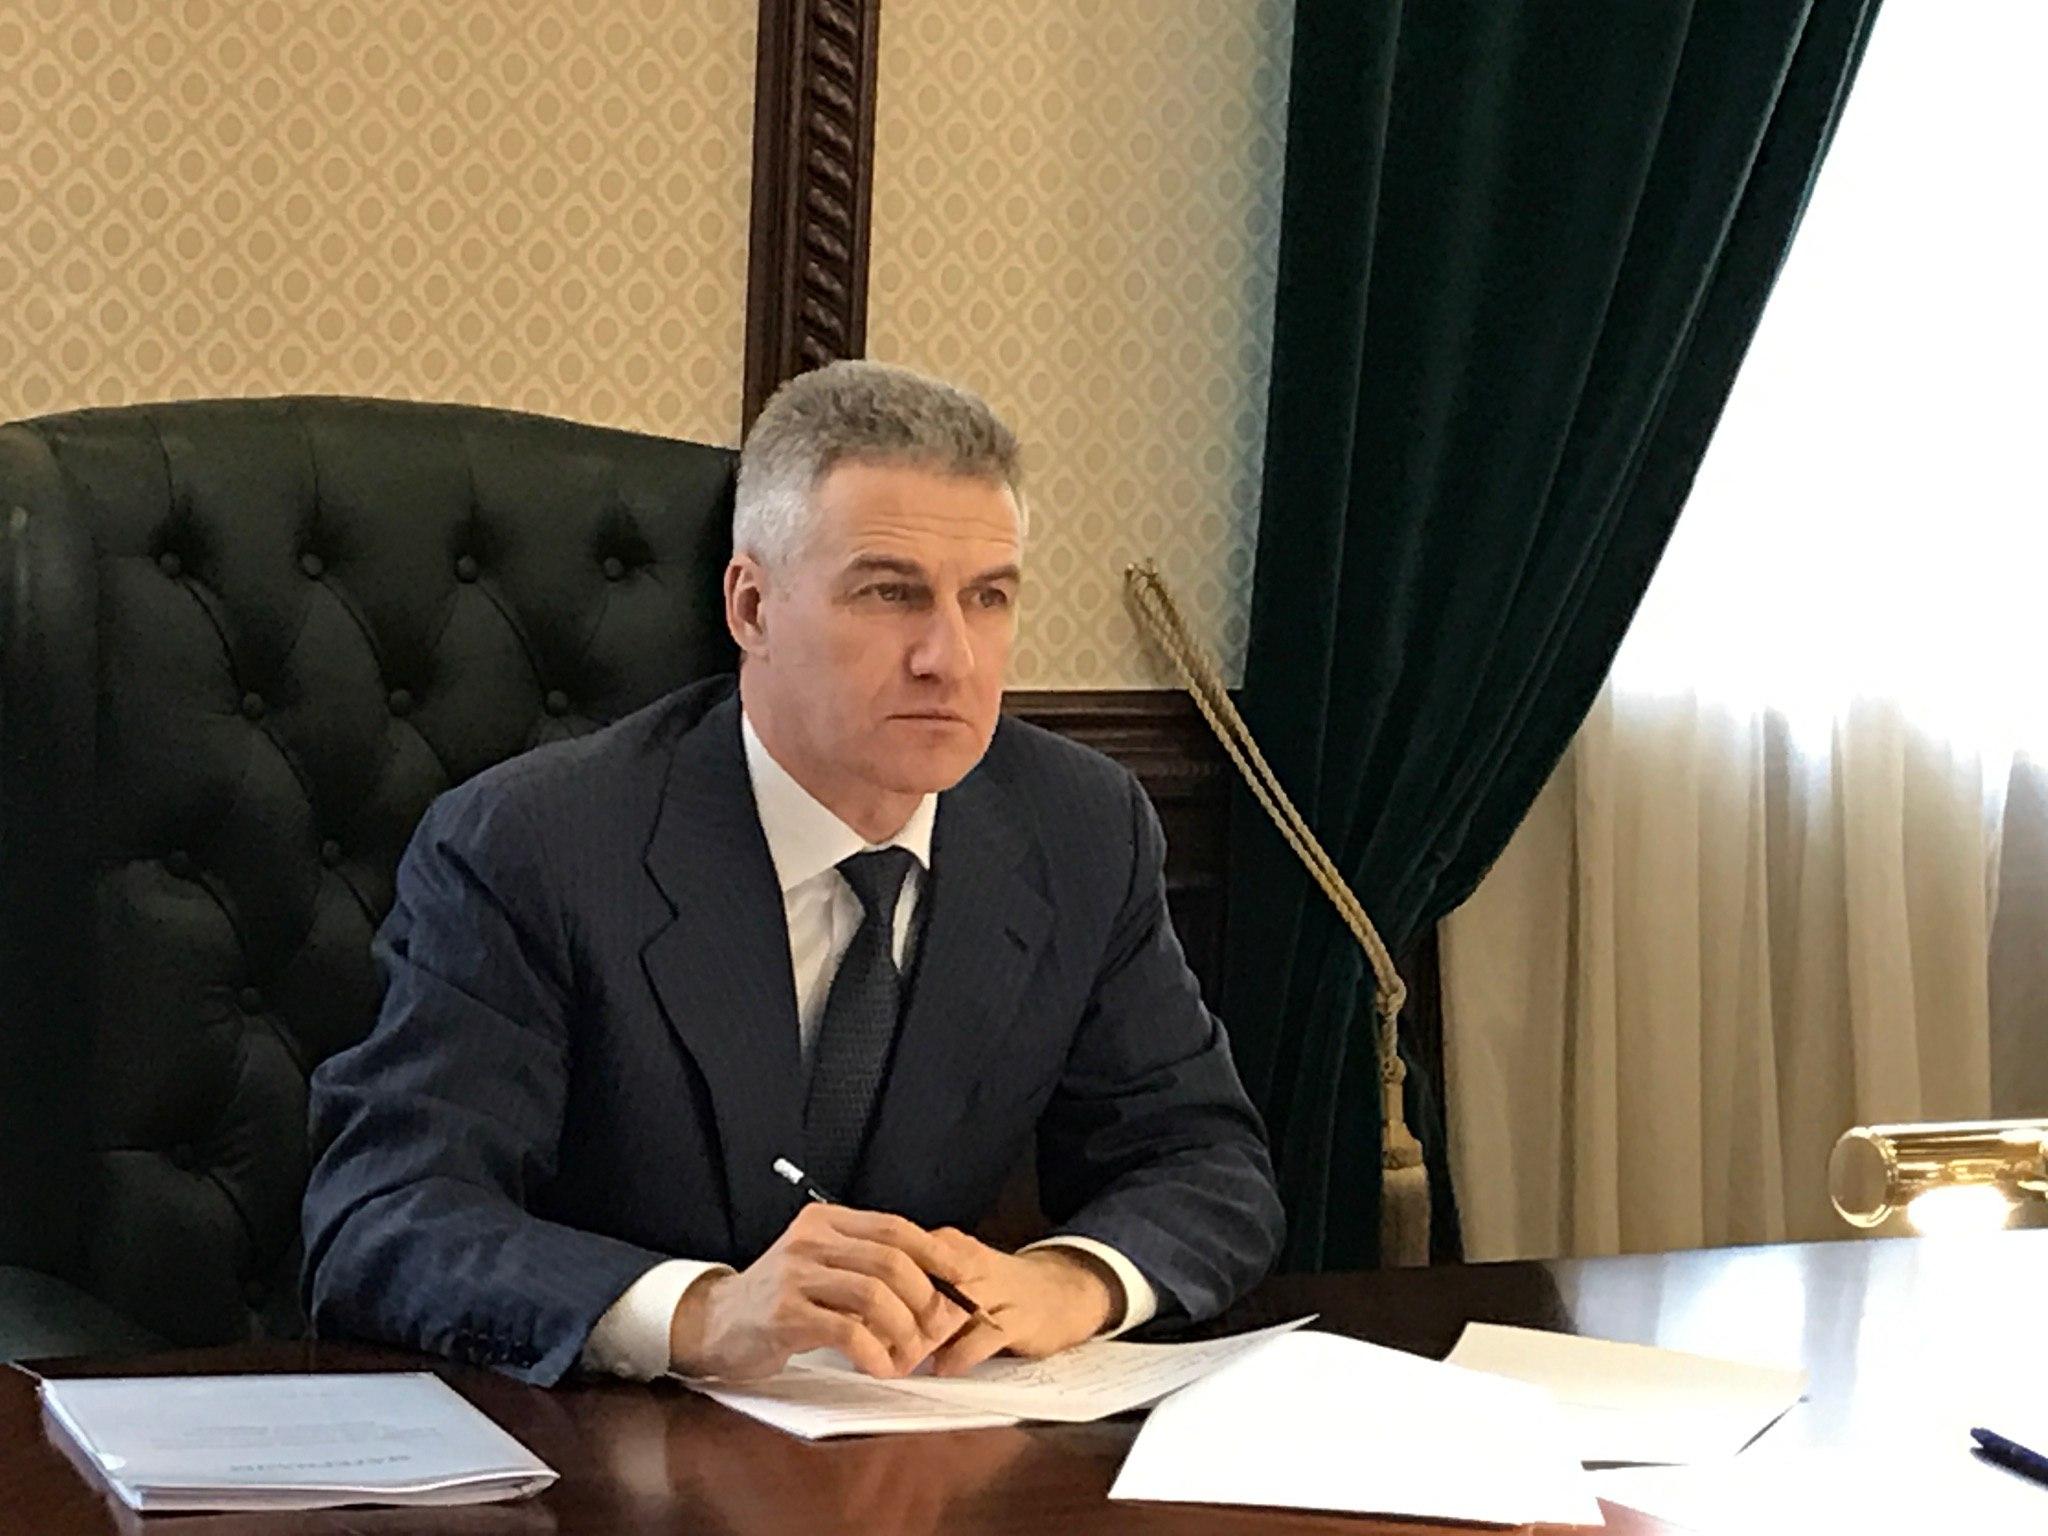 фото ЗакС политика Глава Карелии объявил о введении режима самоизоляции